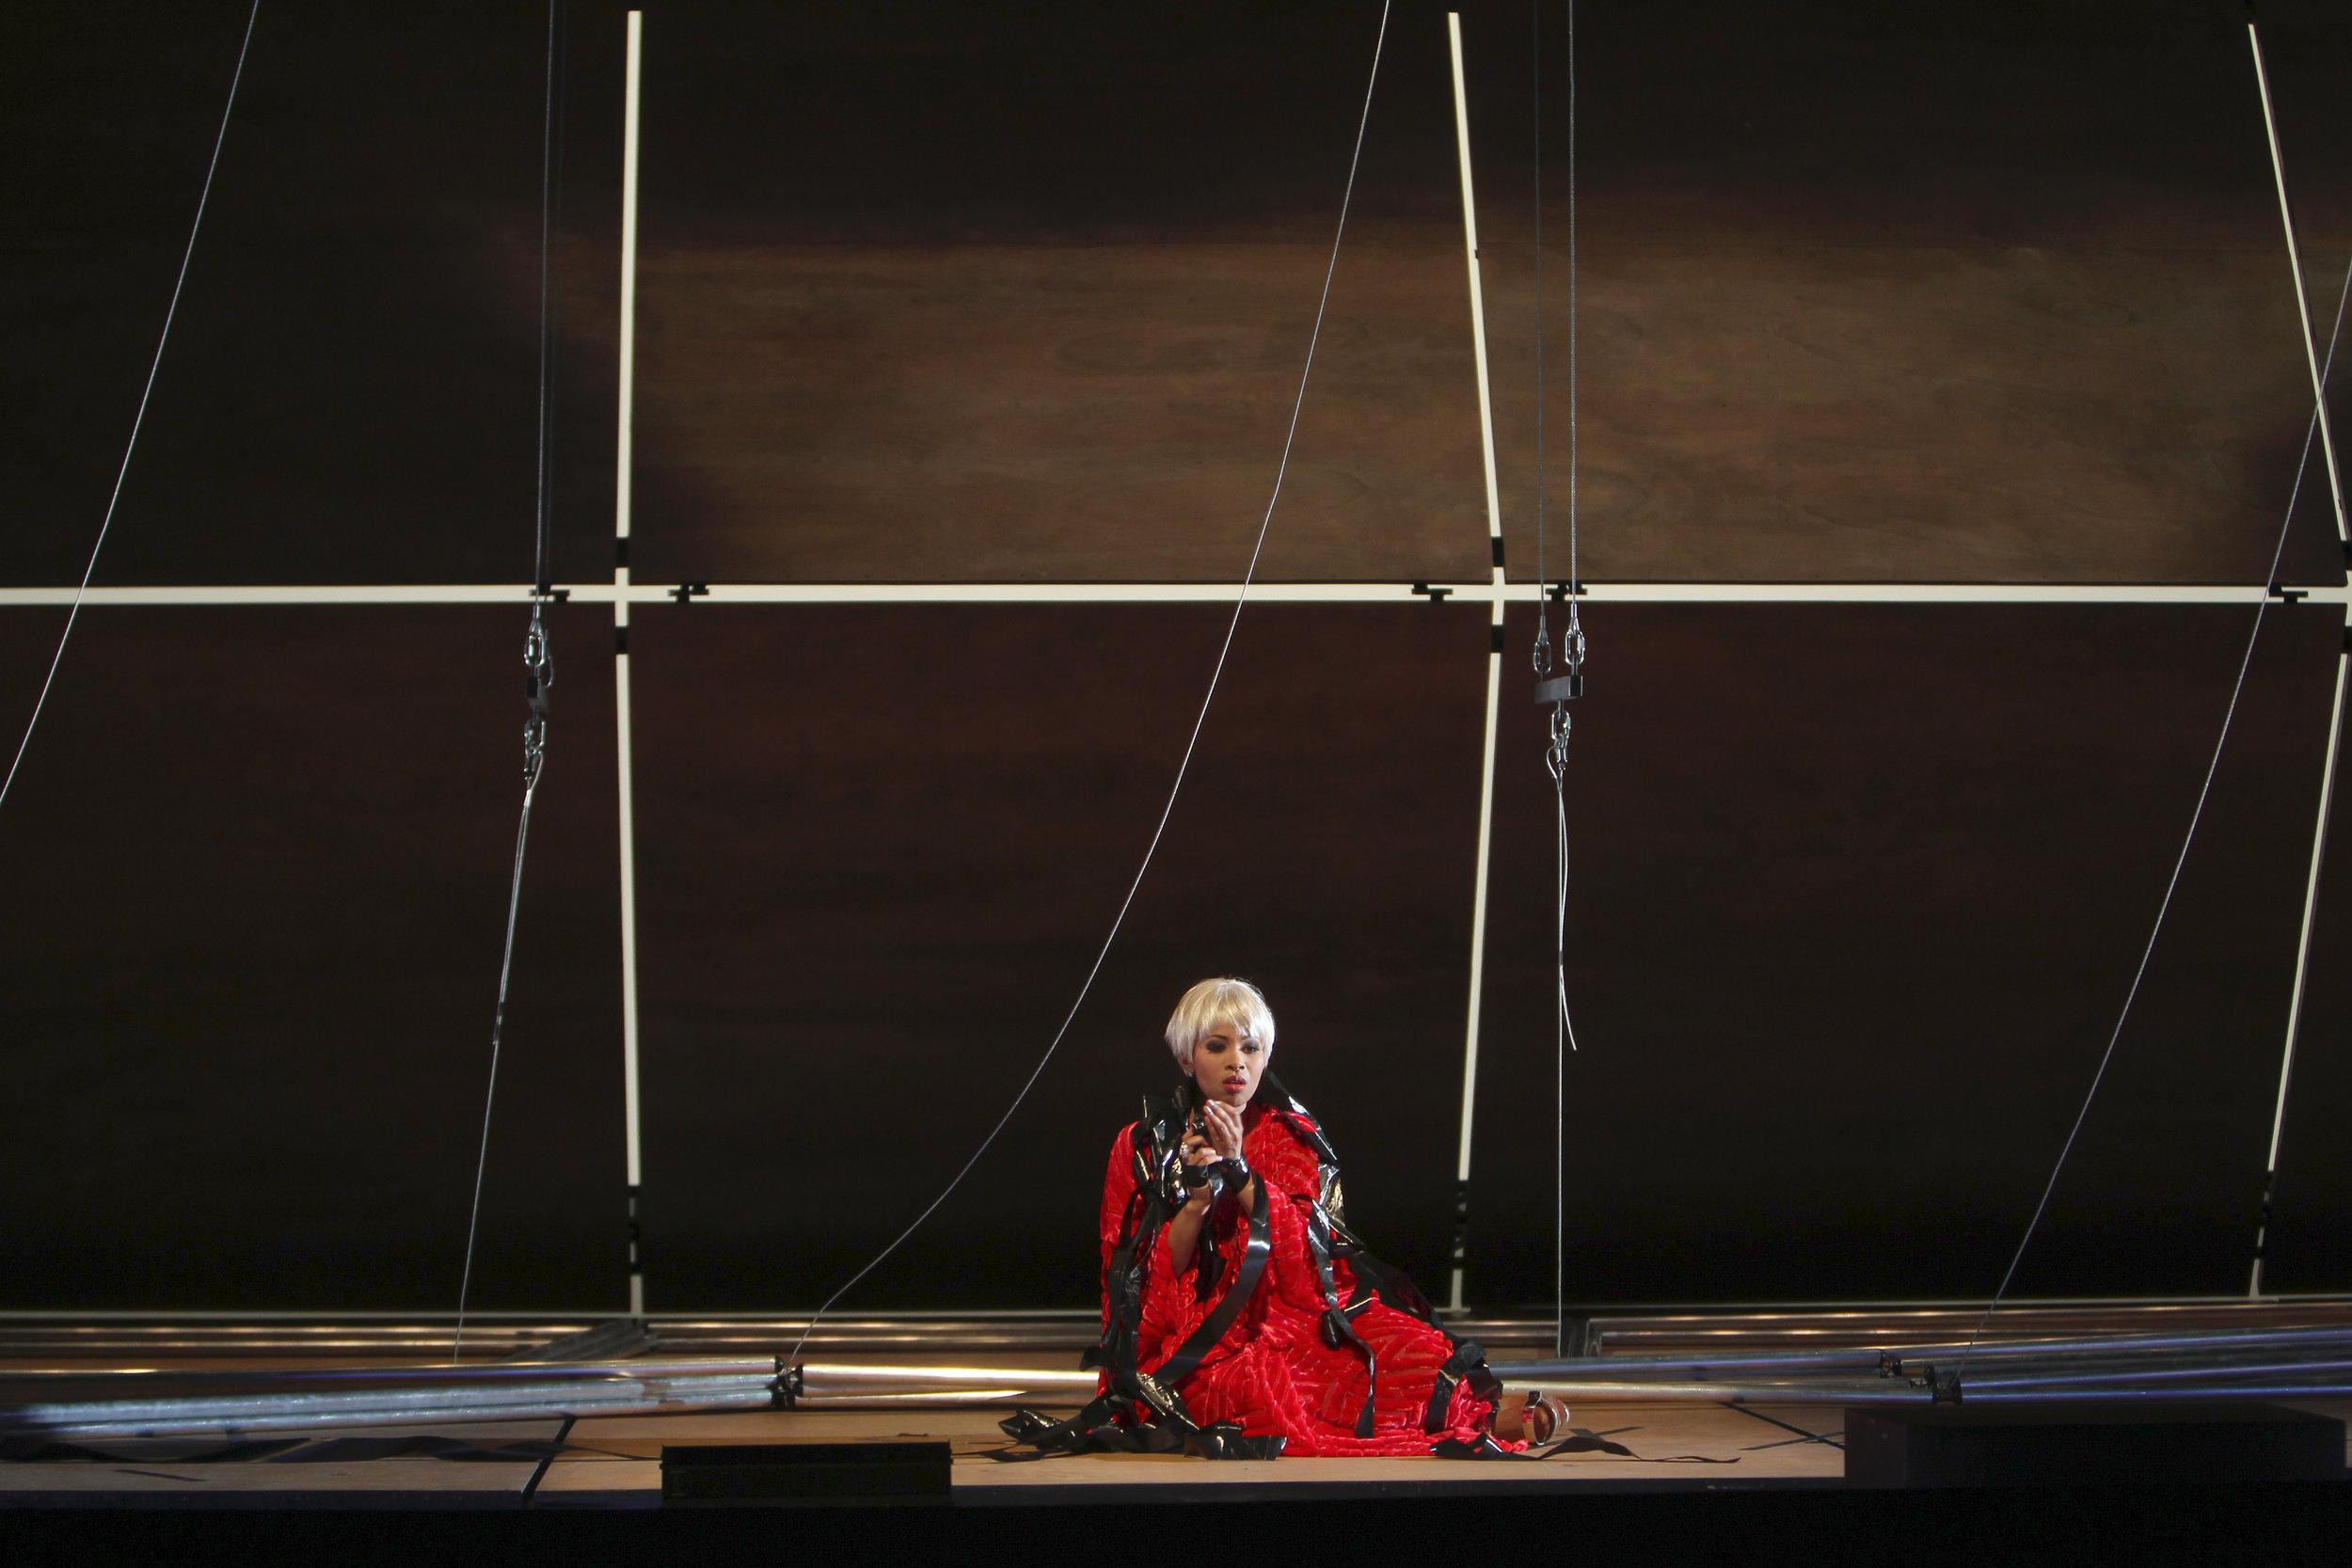 Sibilla in World Premiere of  La bianca notte  at Staatsoper Hamburg. Photo by örg Landsber.